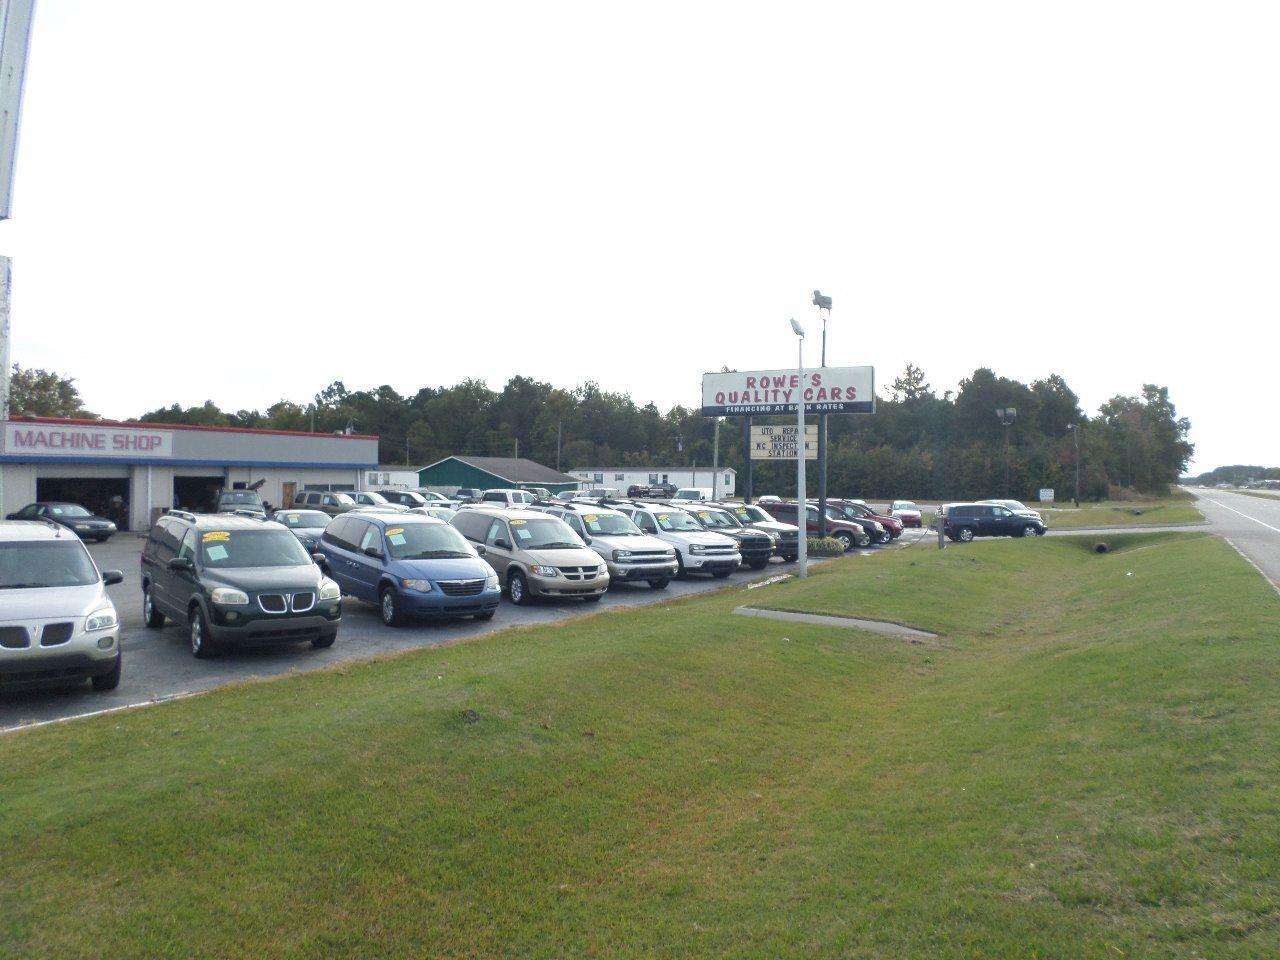 ROWE'S QUALITY CARS INC